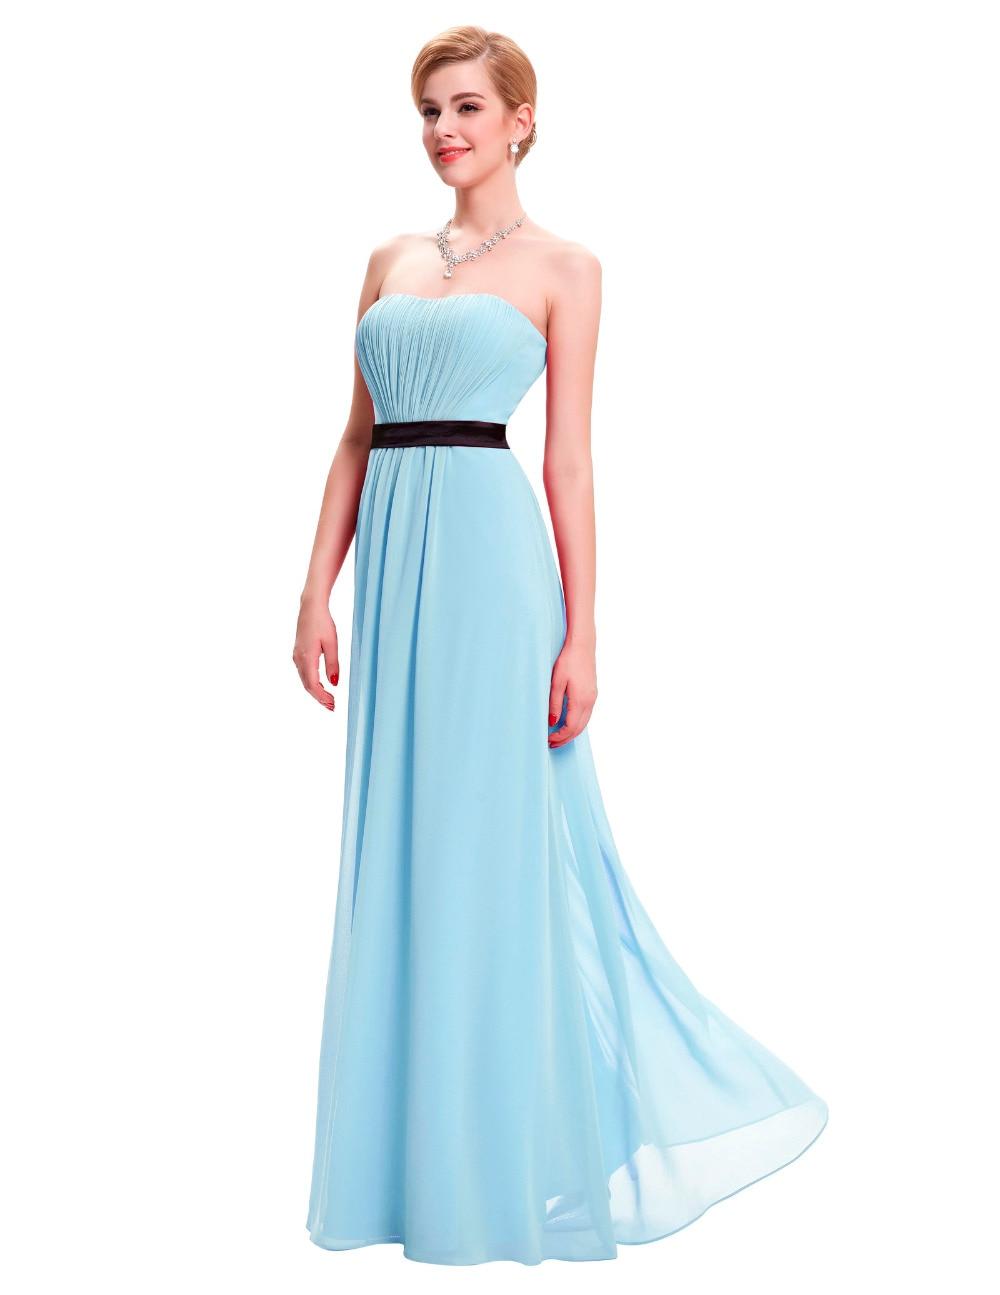 Plus Size Chiffon Wedding Dresses 95 Cool Plus Size White Formal